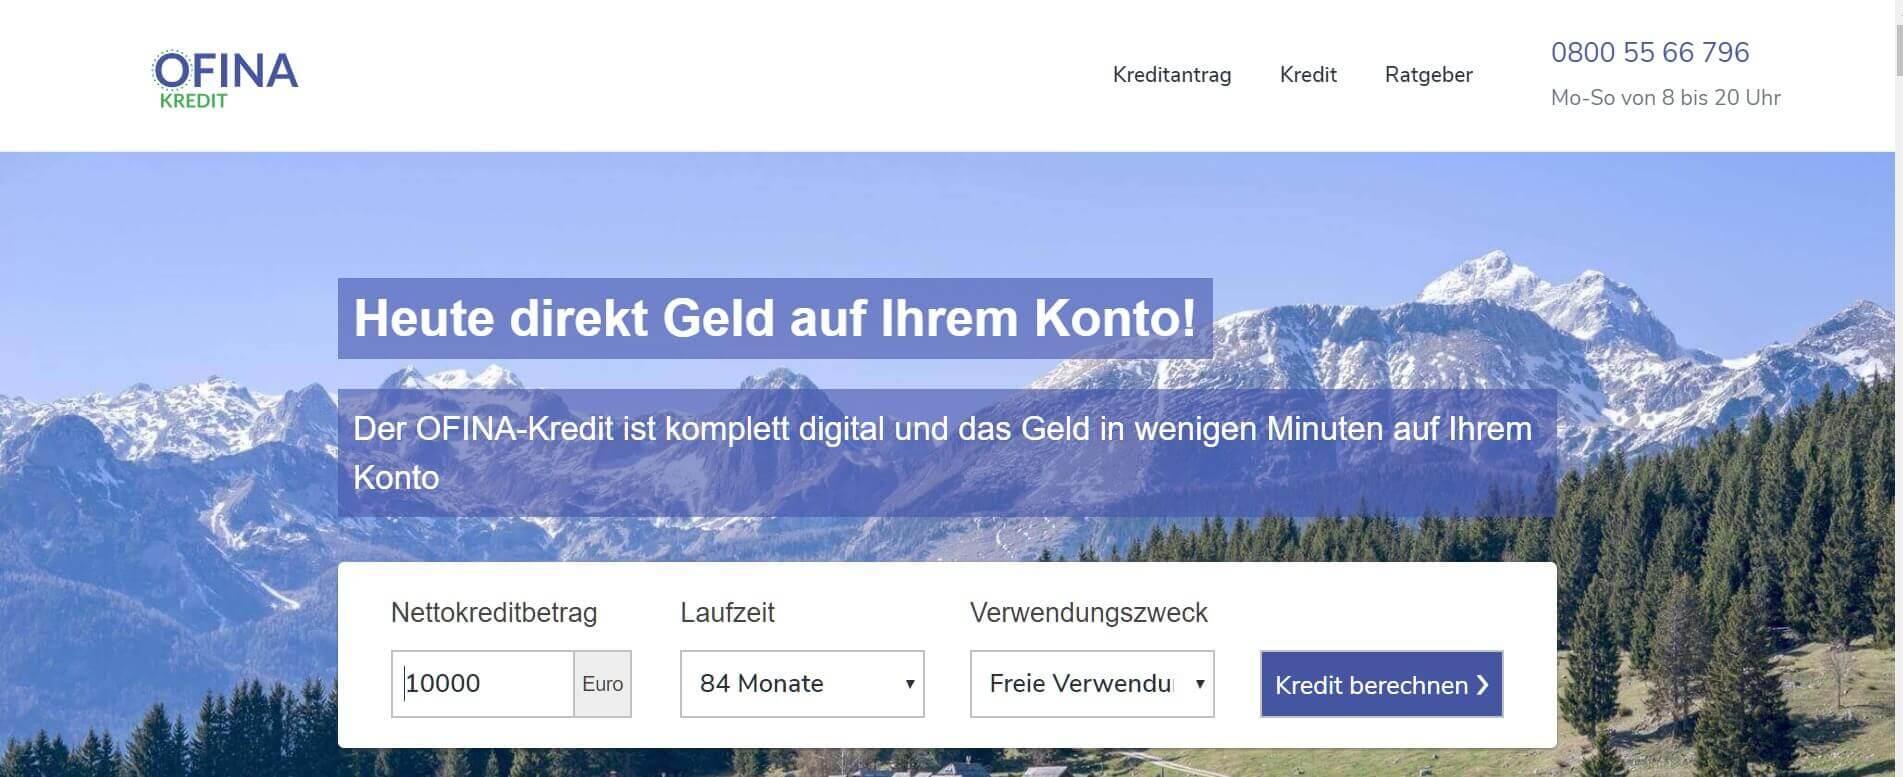 Kleinkredit online OFINA Kredit